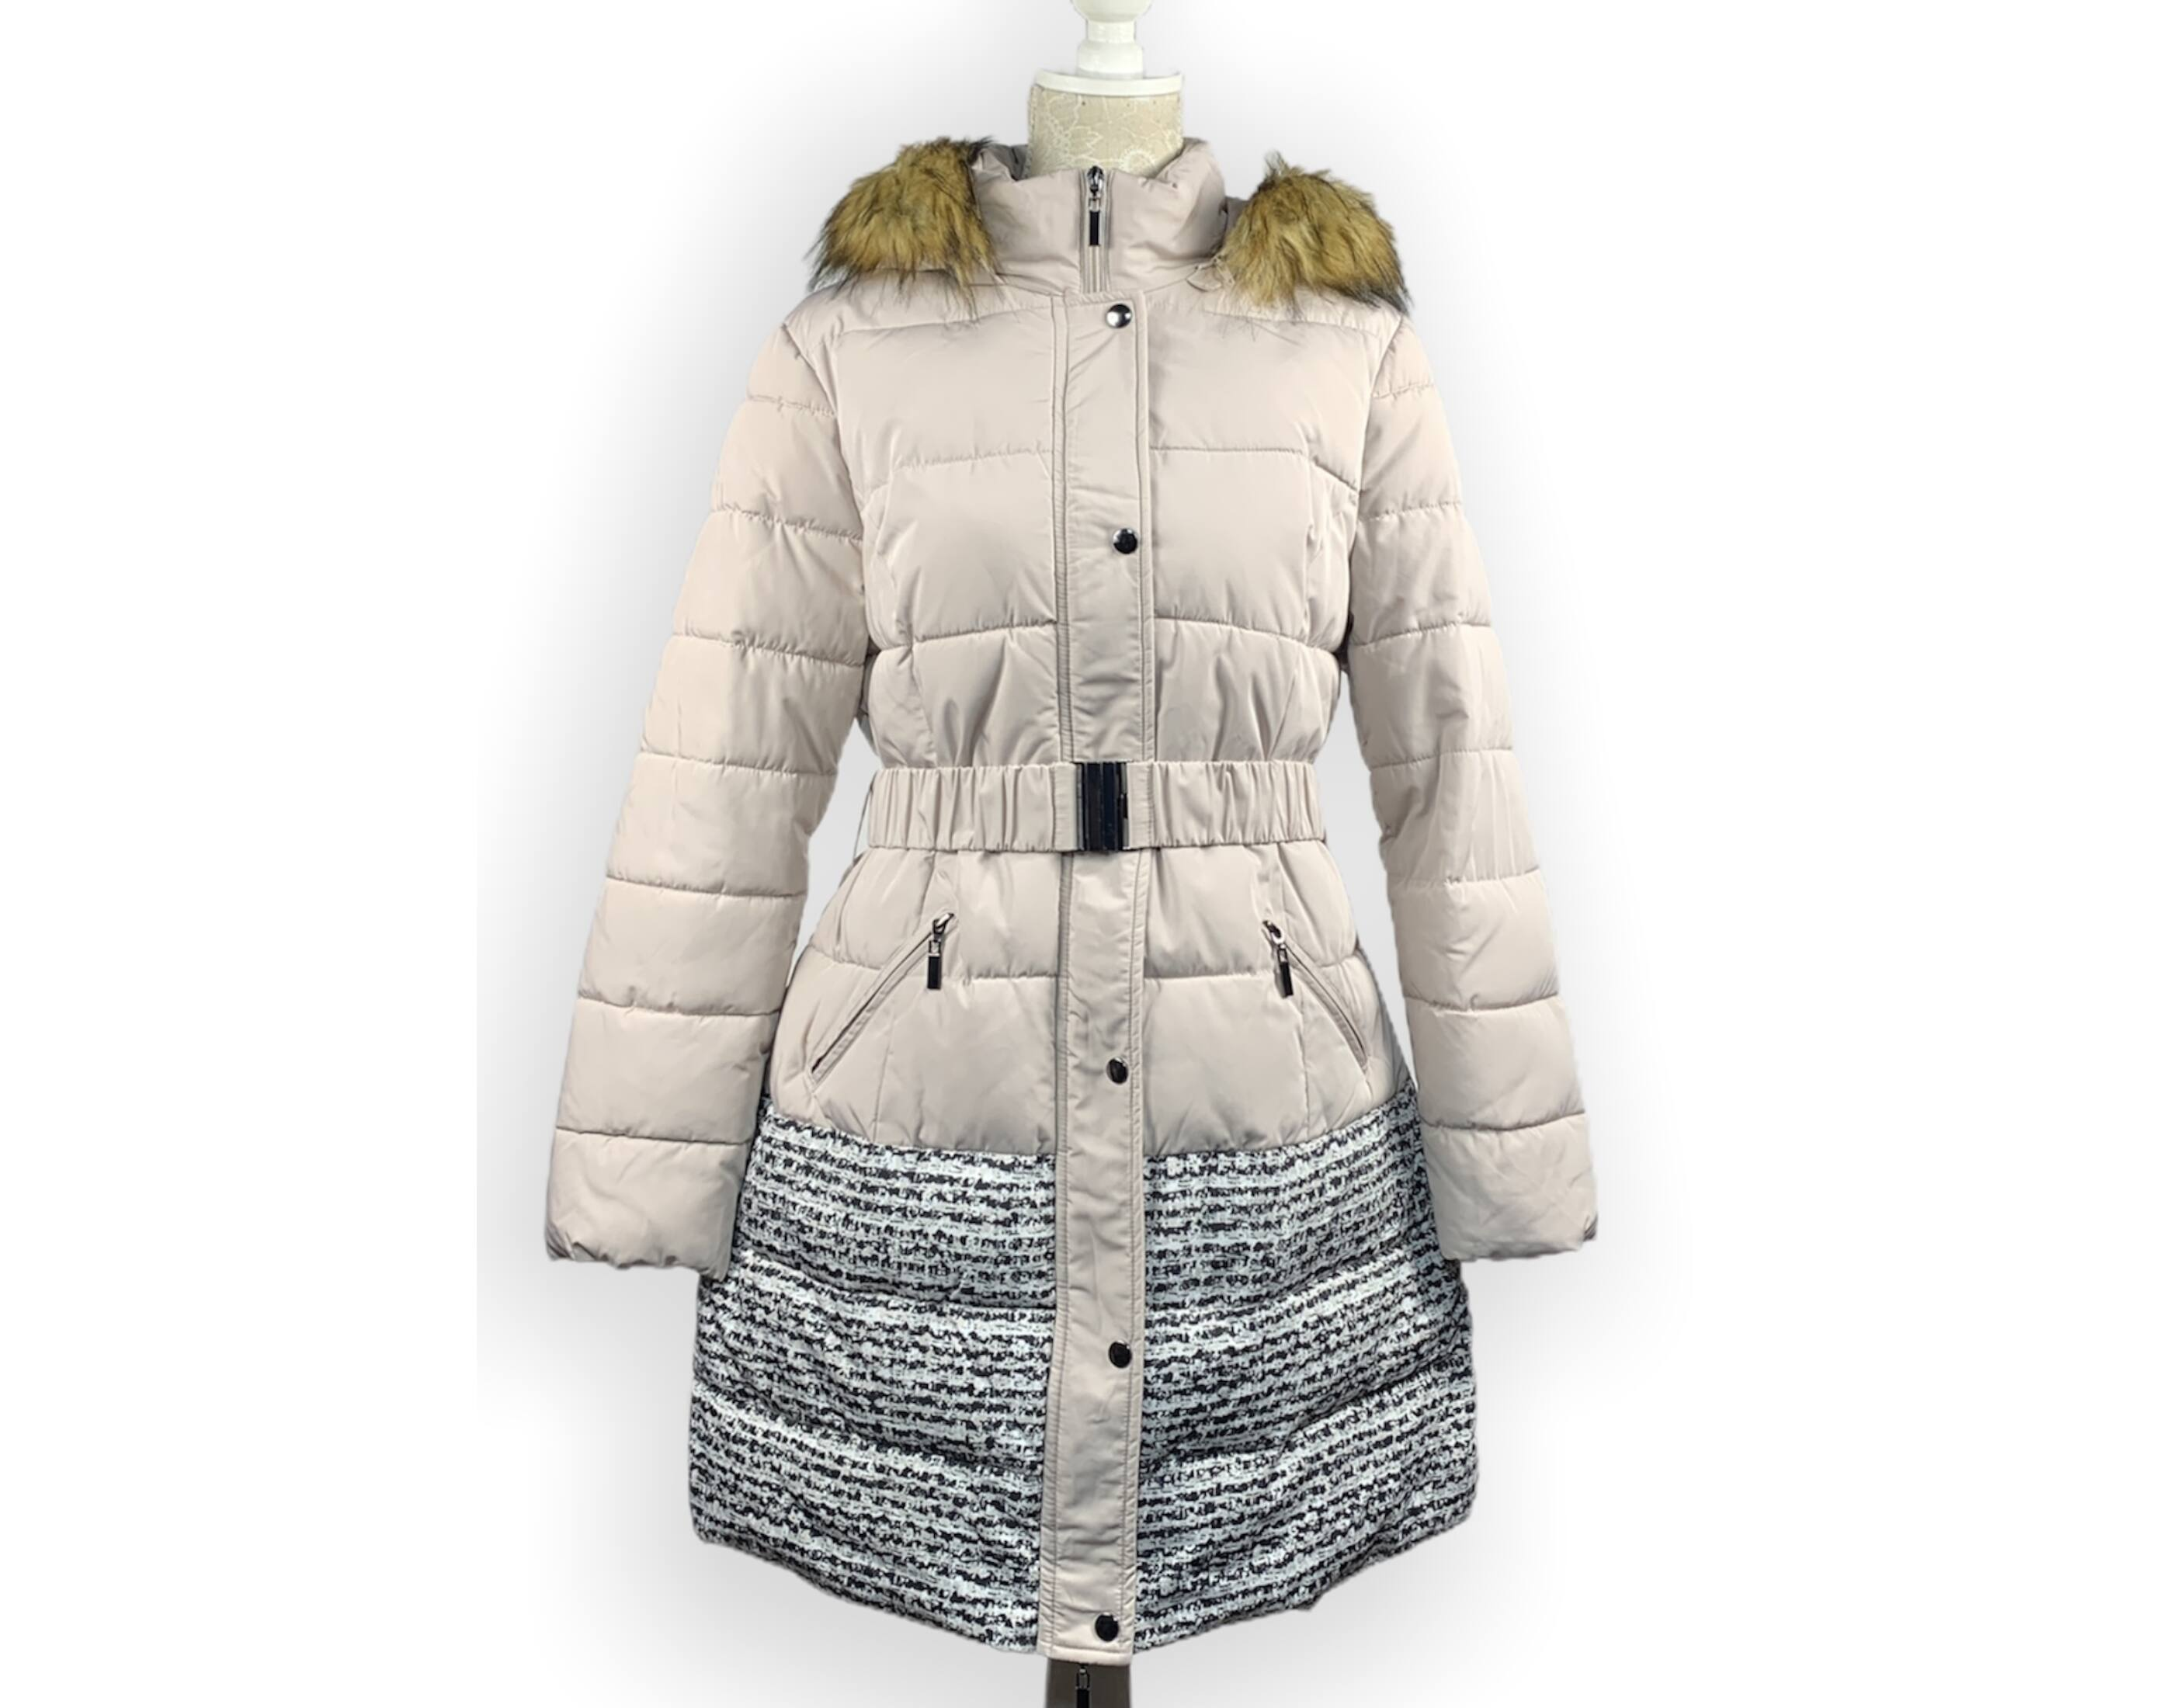 Himmelblau by Lola Paltinger kabát (40)